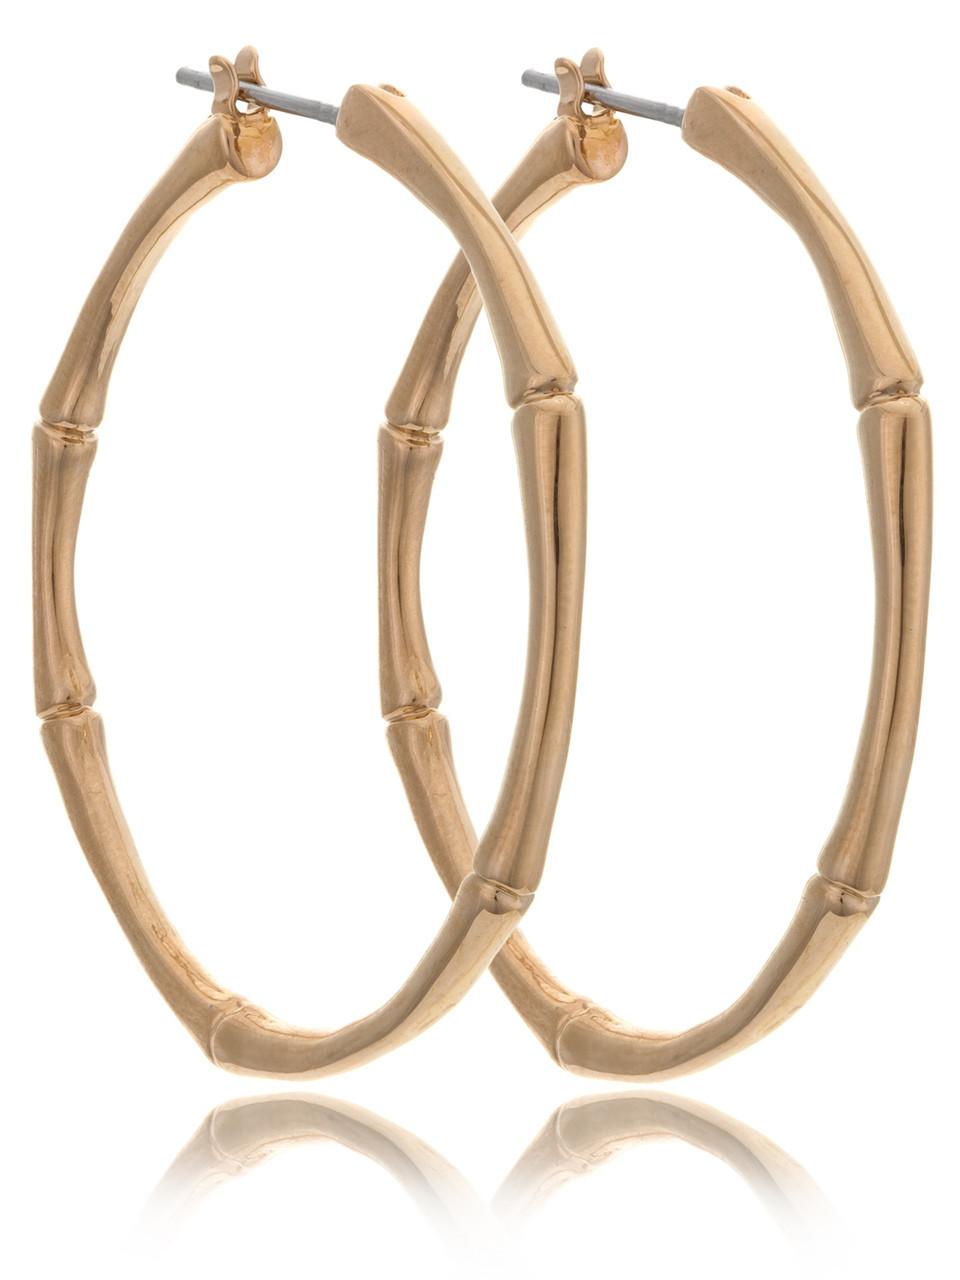 83622f158 Bamboo Hoop Earrings, Gold-Plated Fashion Jewelry & Wholesale Fine Fashion  Accessories | Shop JGI Jewelry